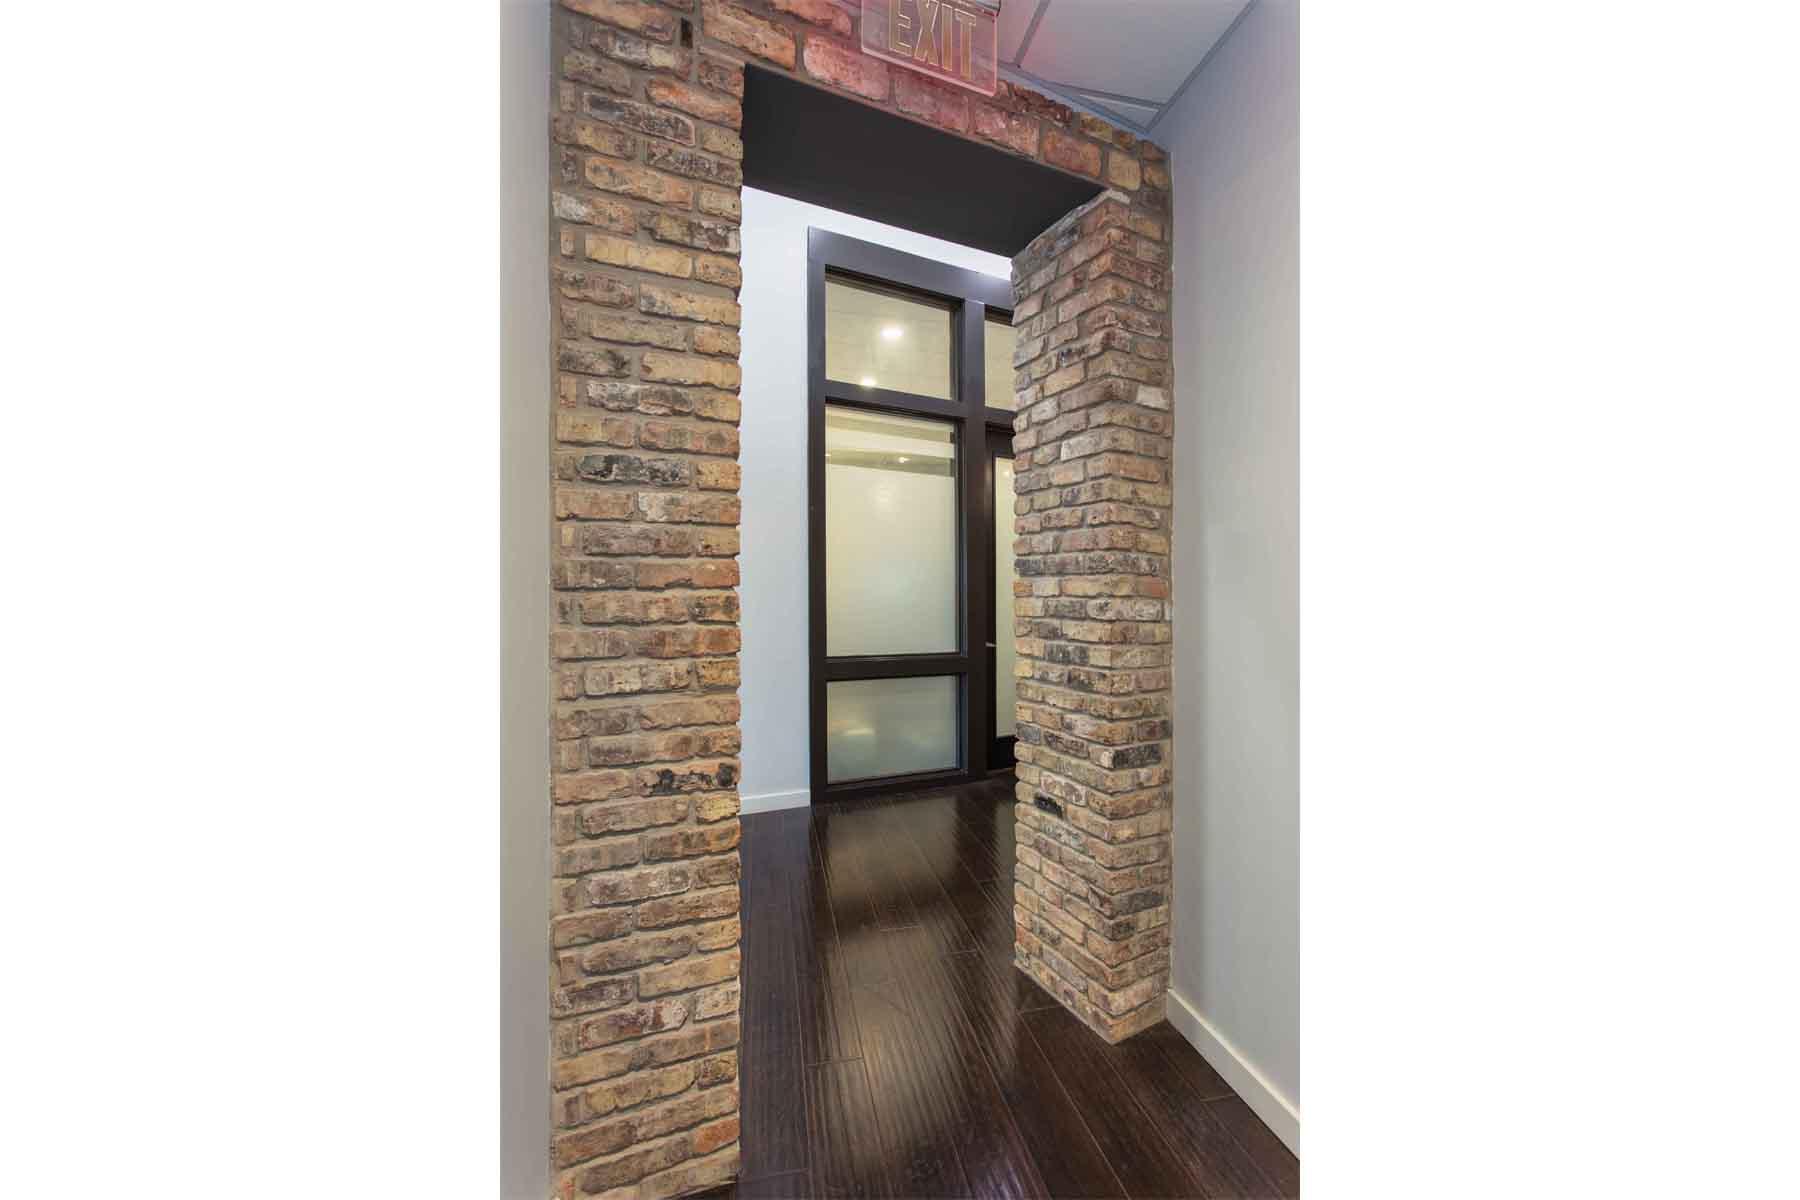 moody-orthodontics-hallway-details